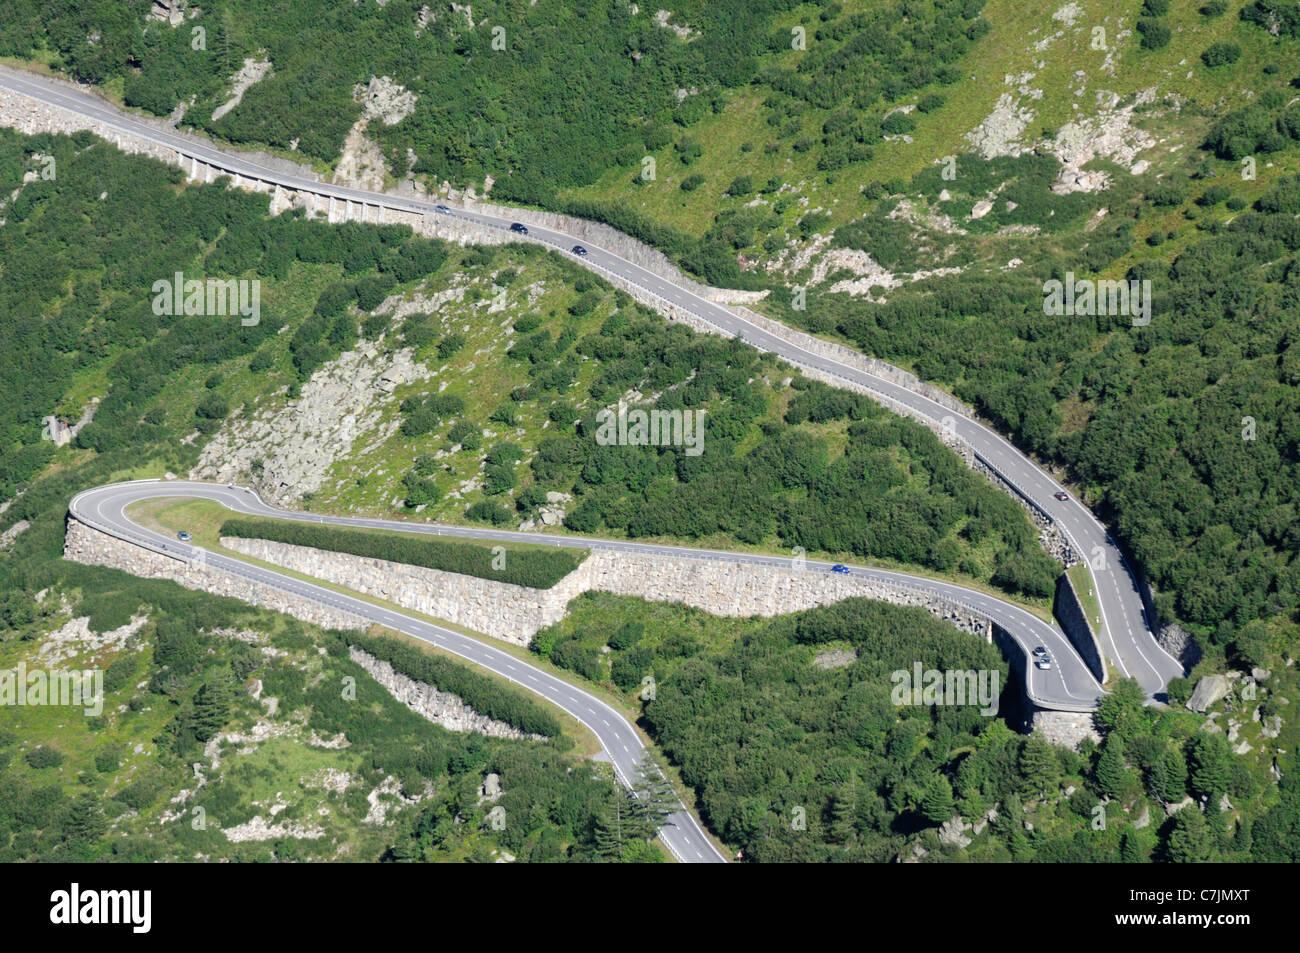 Switzerland, Furkapass nr. Gletsch. South-western ascent of the Furka mountain road from Gletsch. - Stock Image